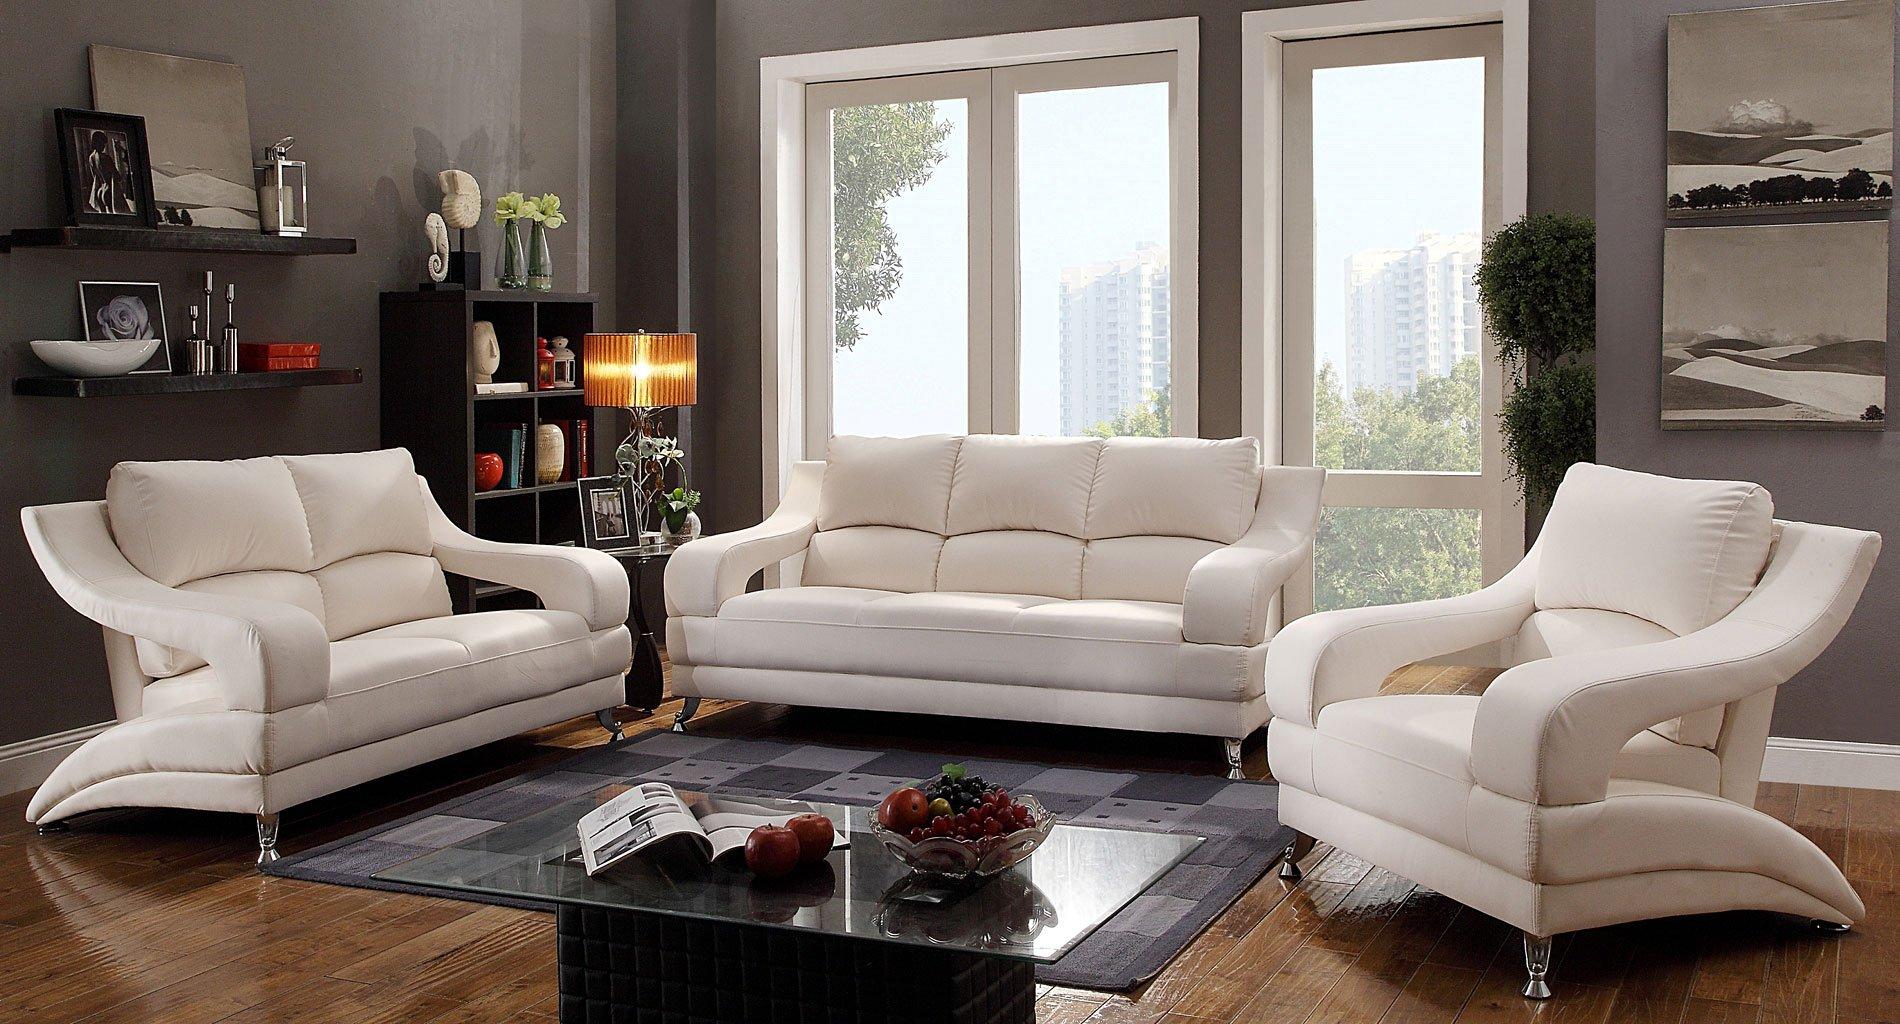 G247 Modern Living Room Set (White) By Glory Furniture